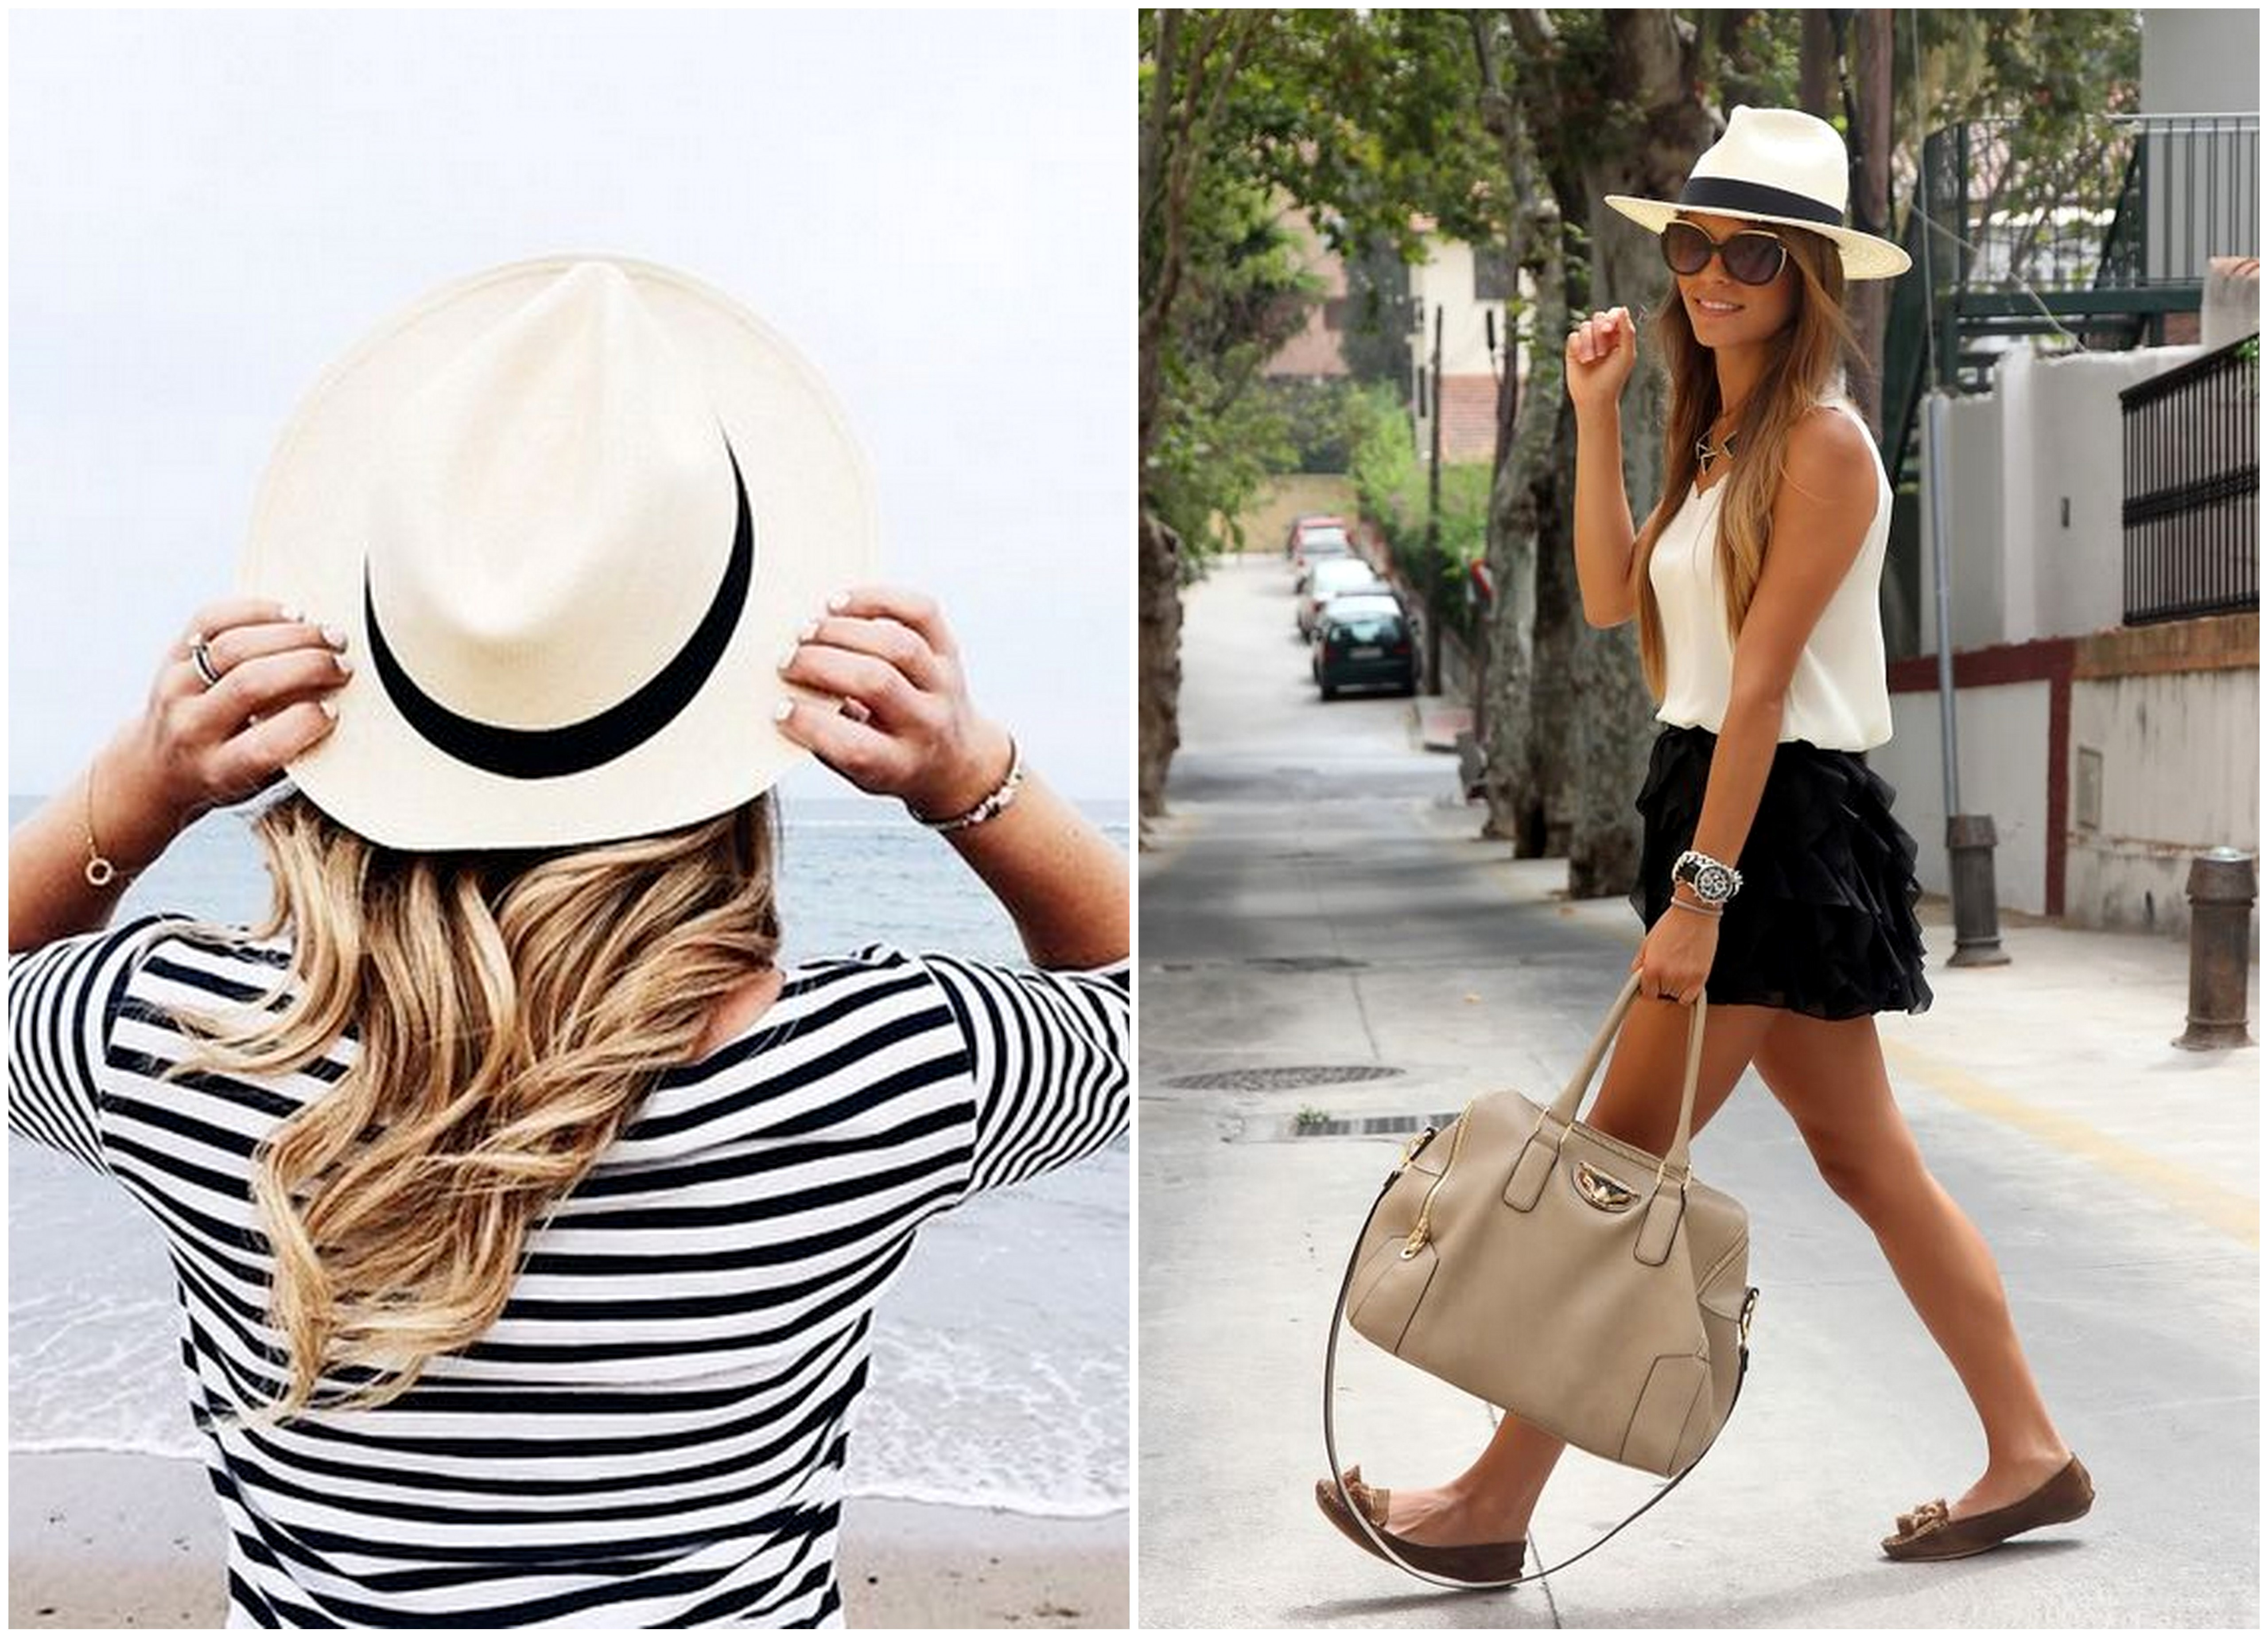 Panama hattu